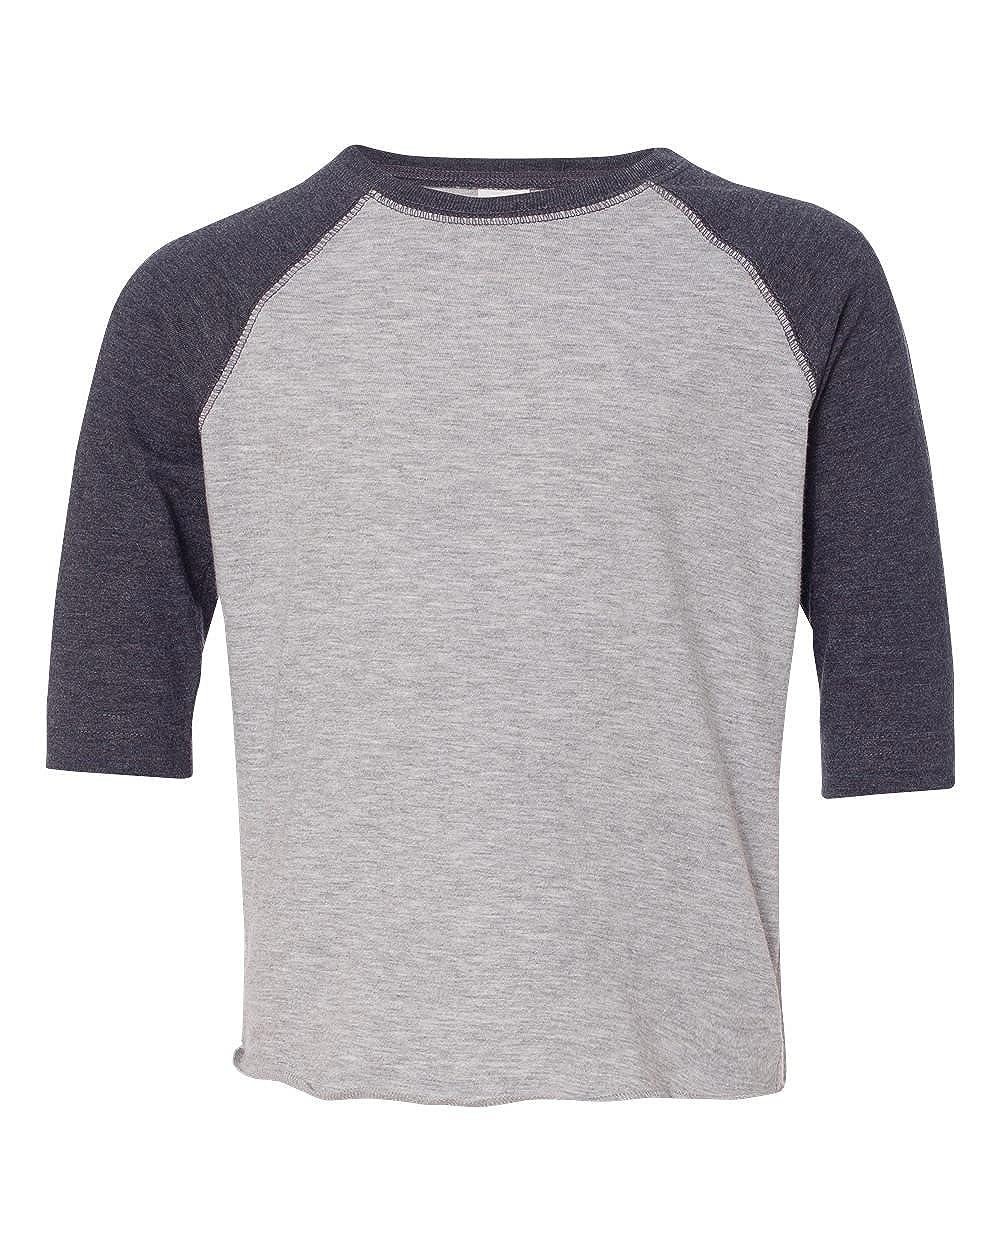 VN Heather//V 3T Clementine Toddler Baseball Fine Jersey T-Shirt RS3330